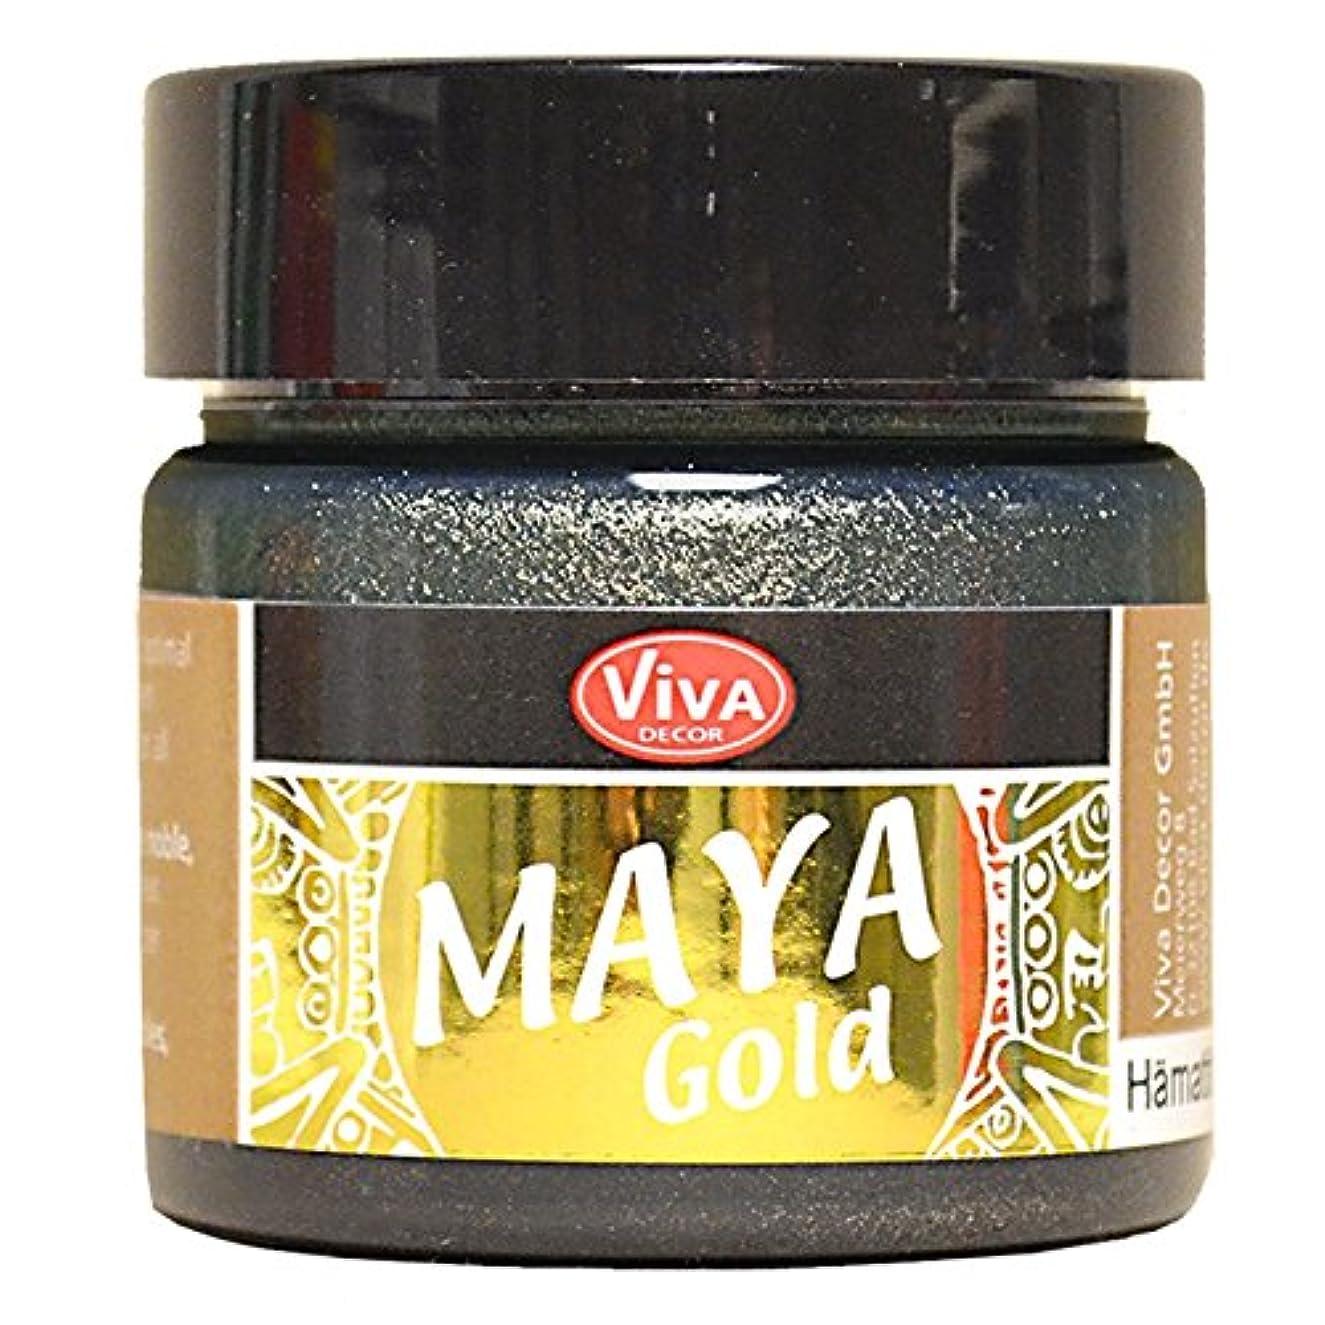 Viva Decor Haematite Maya Gold Paint, Acrylic, Grey, Medium